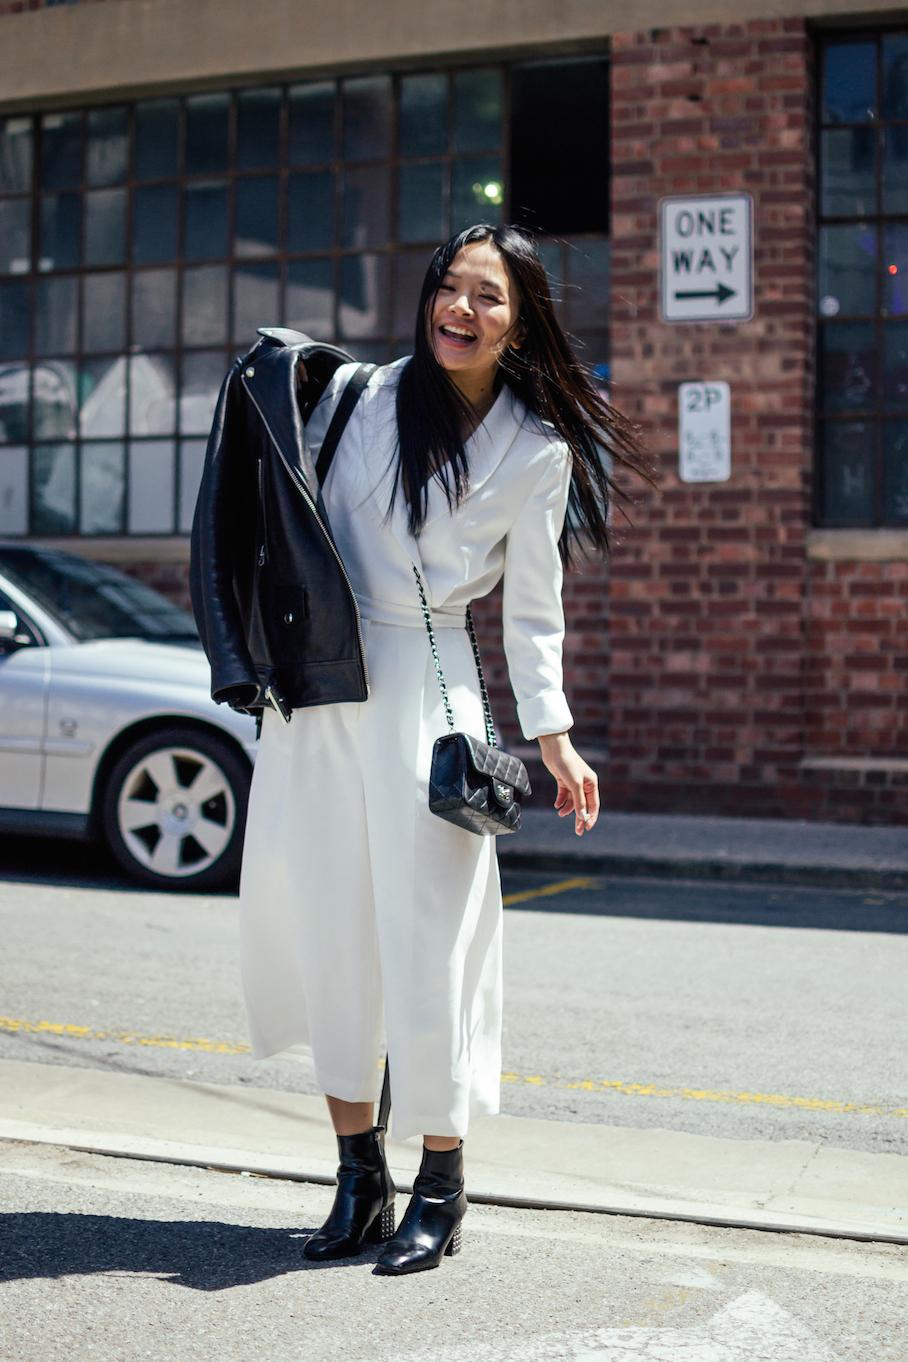 SA: Haiyun Xu, PR Manger - Australian Fashion Labels China at the Adelaide Fashion Festival. Photo: Dimitra Koriozos